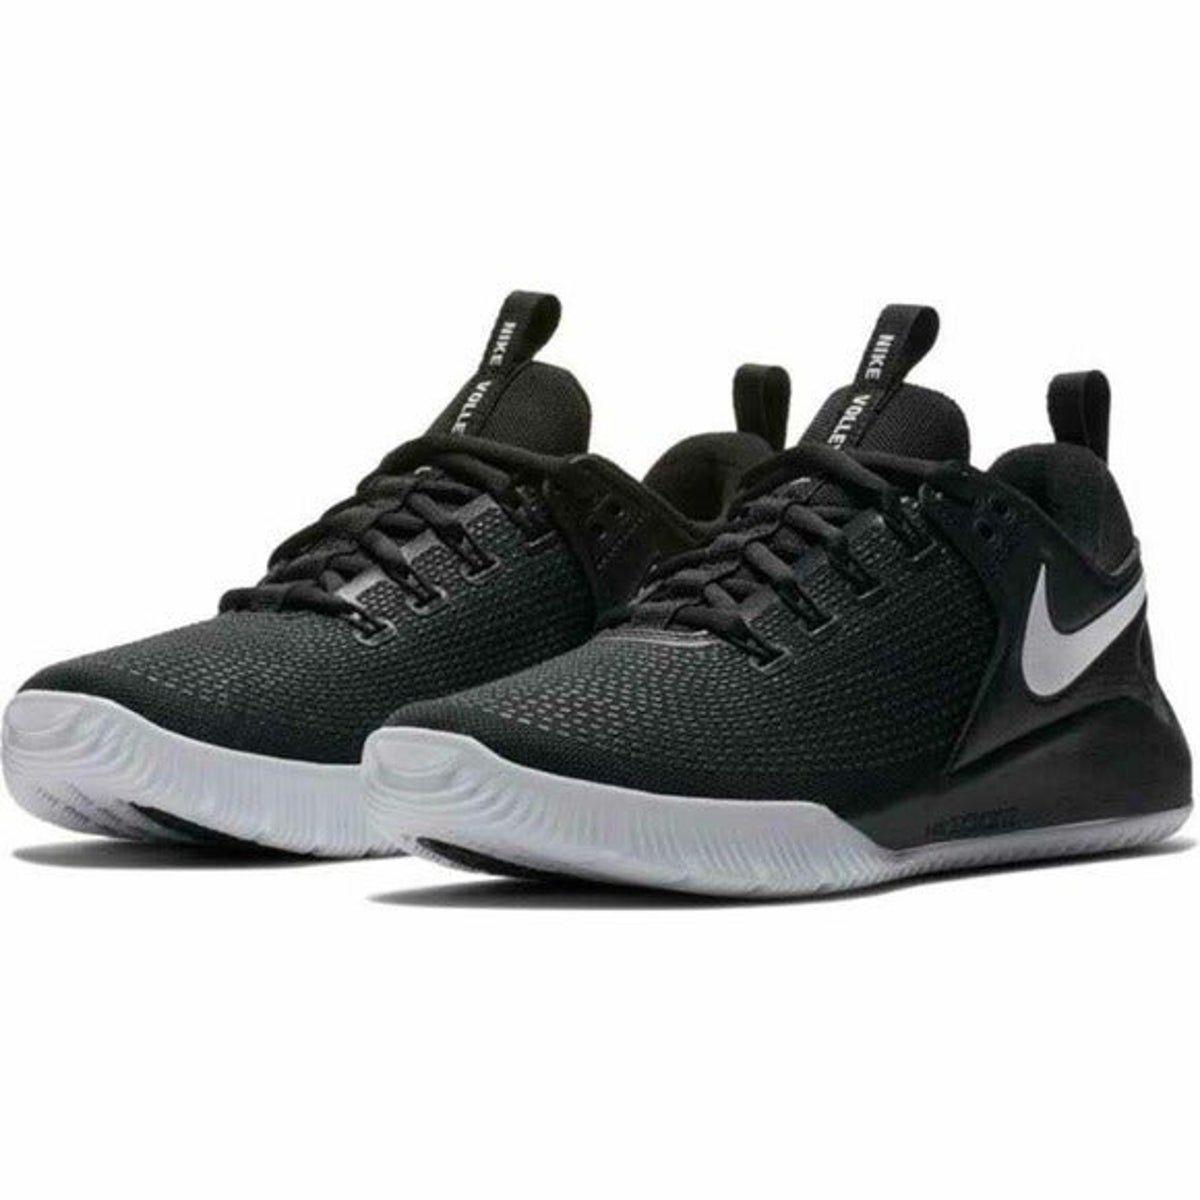 Nike Women S Volleyball Shoes React Hyperset In 2020 Volleyball Shoes Nike Women Nike